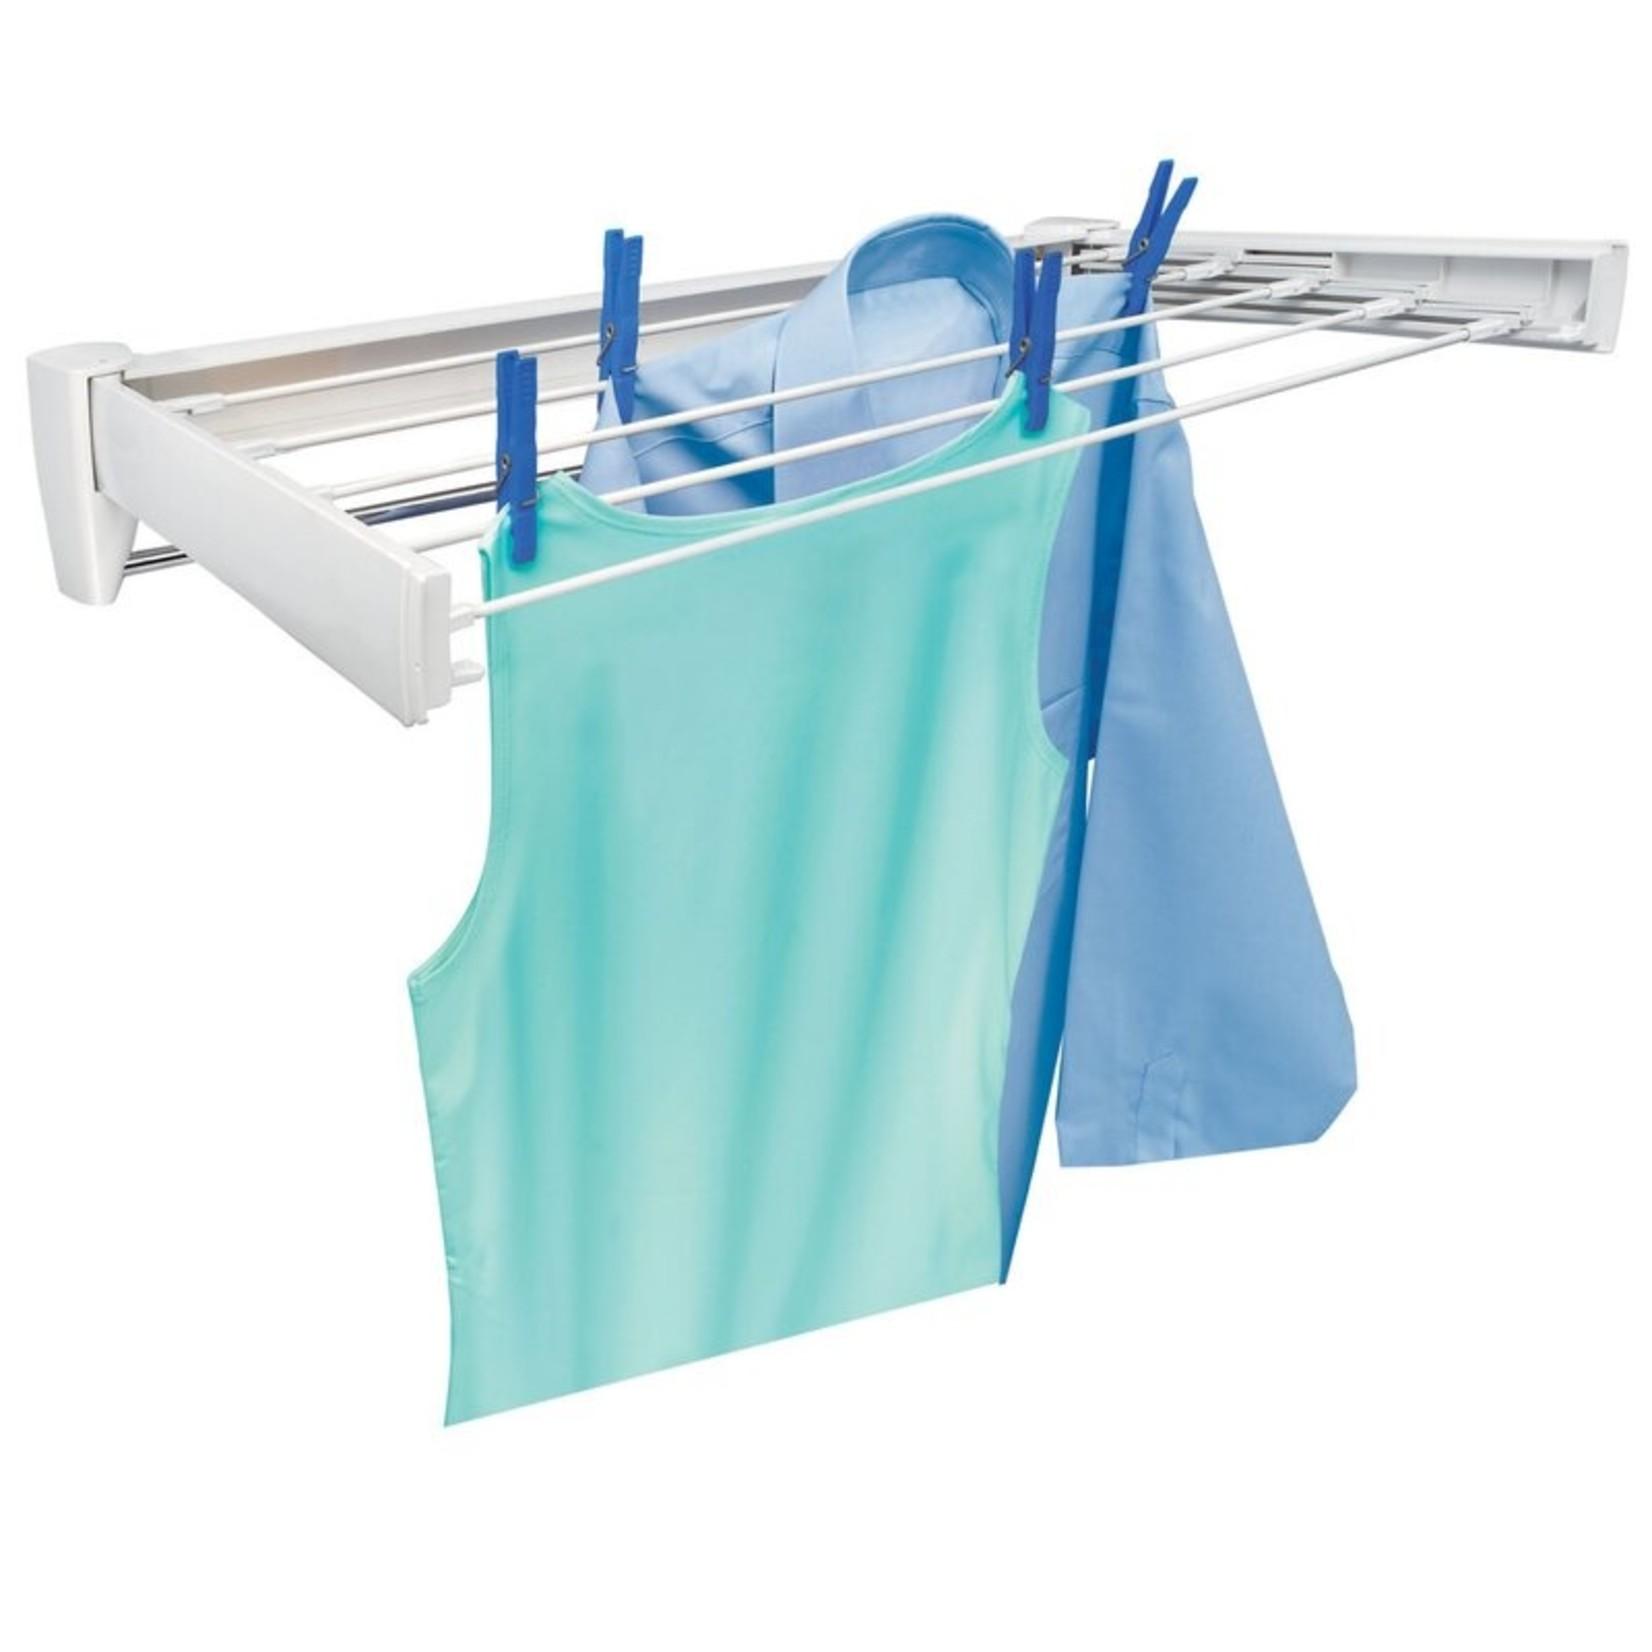 *Telegant Wall-Mount Folding Drying Rack